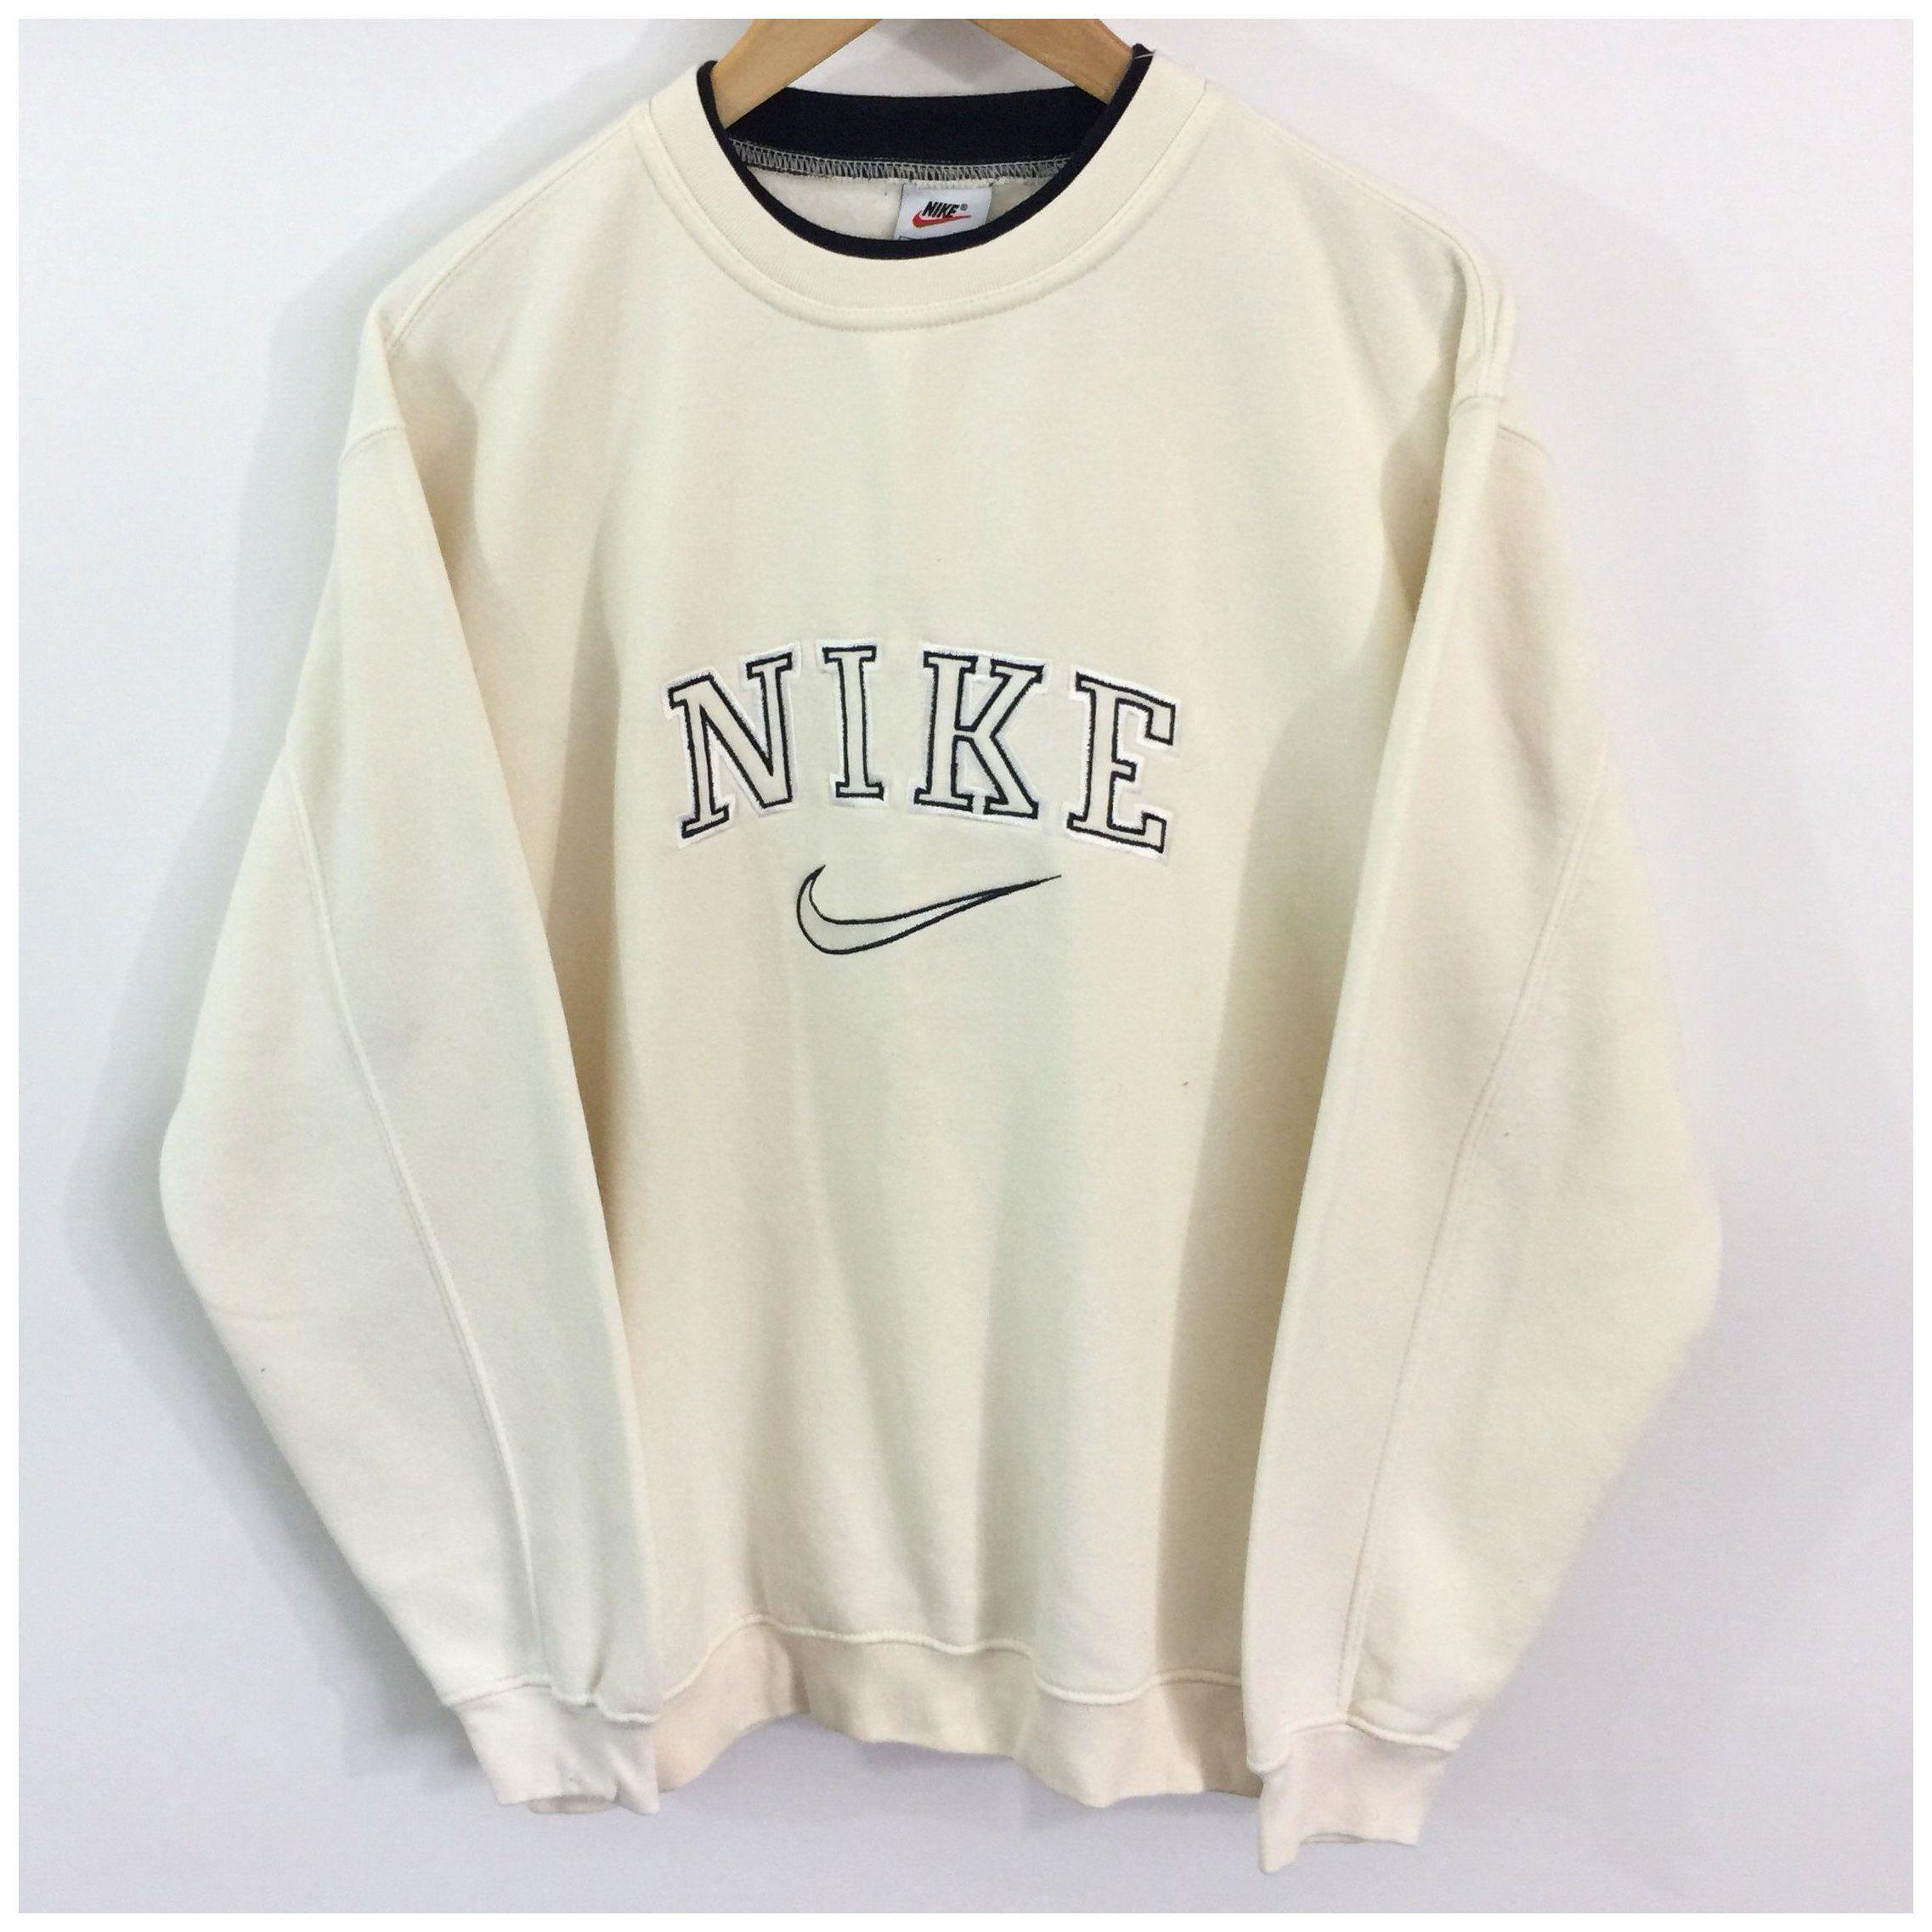 Vintage Nike Sweatshirt Label Size Medium Cream Depop Vintage Nike Sweatshirt Aesthetic Vintage Nike Sweatshirt Sweatshirt Outfit Vintage Hoodies [ 2274 x 2274 Pixel ]